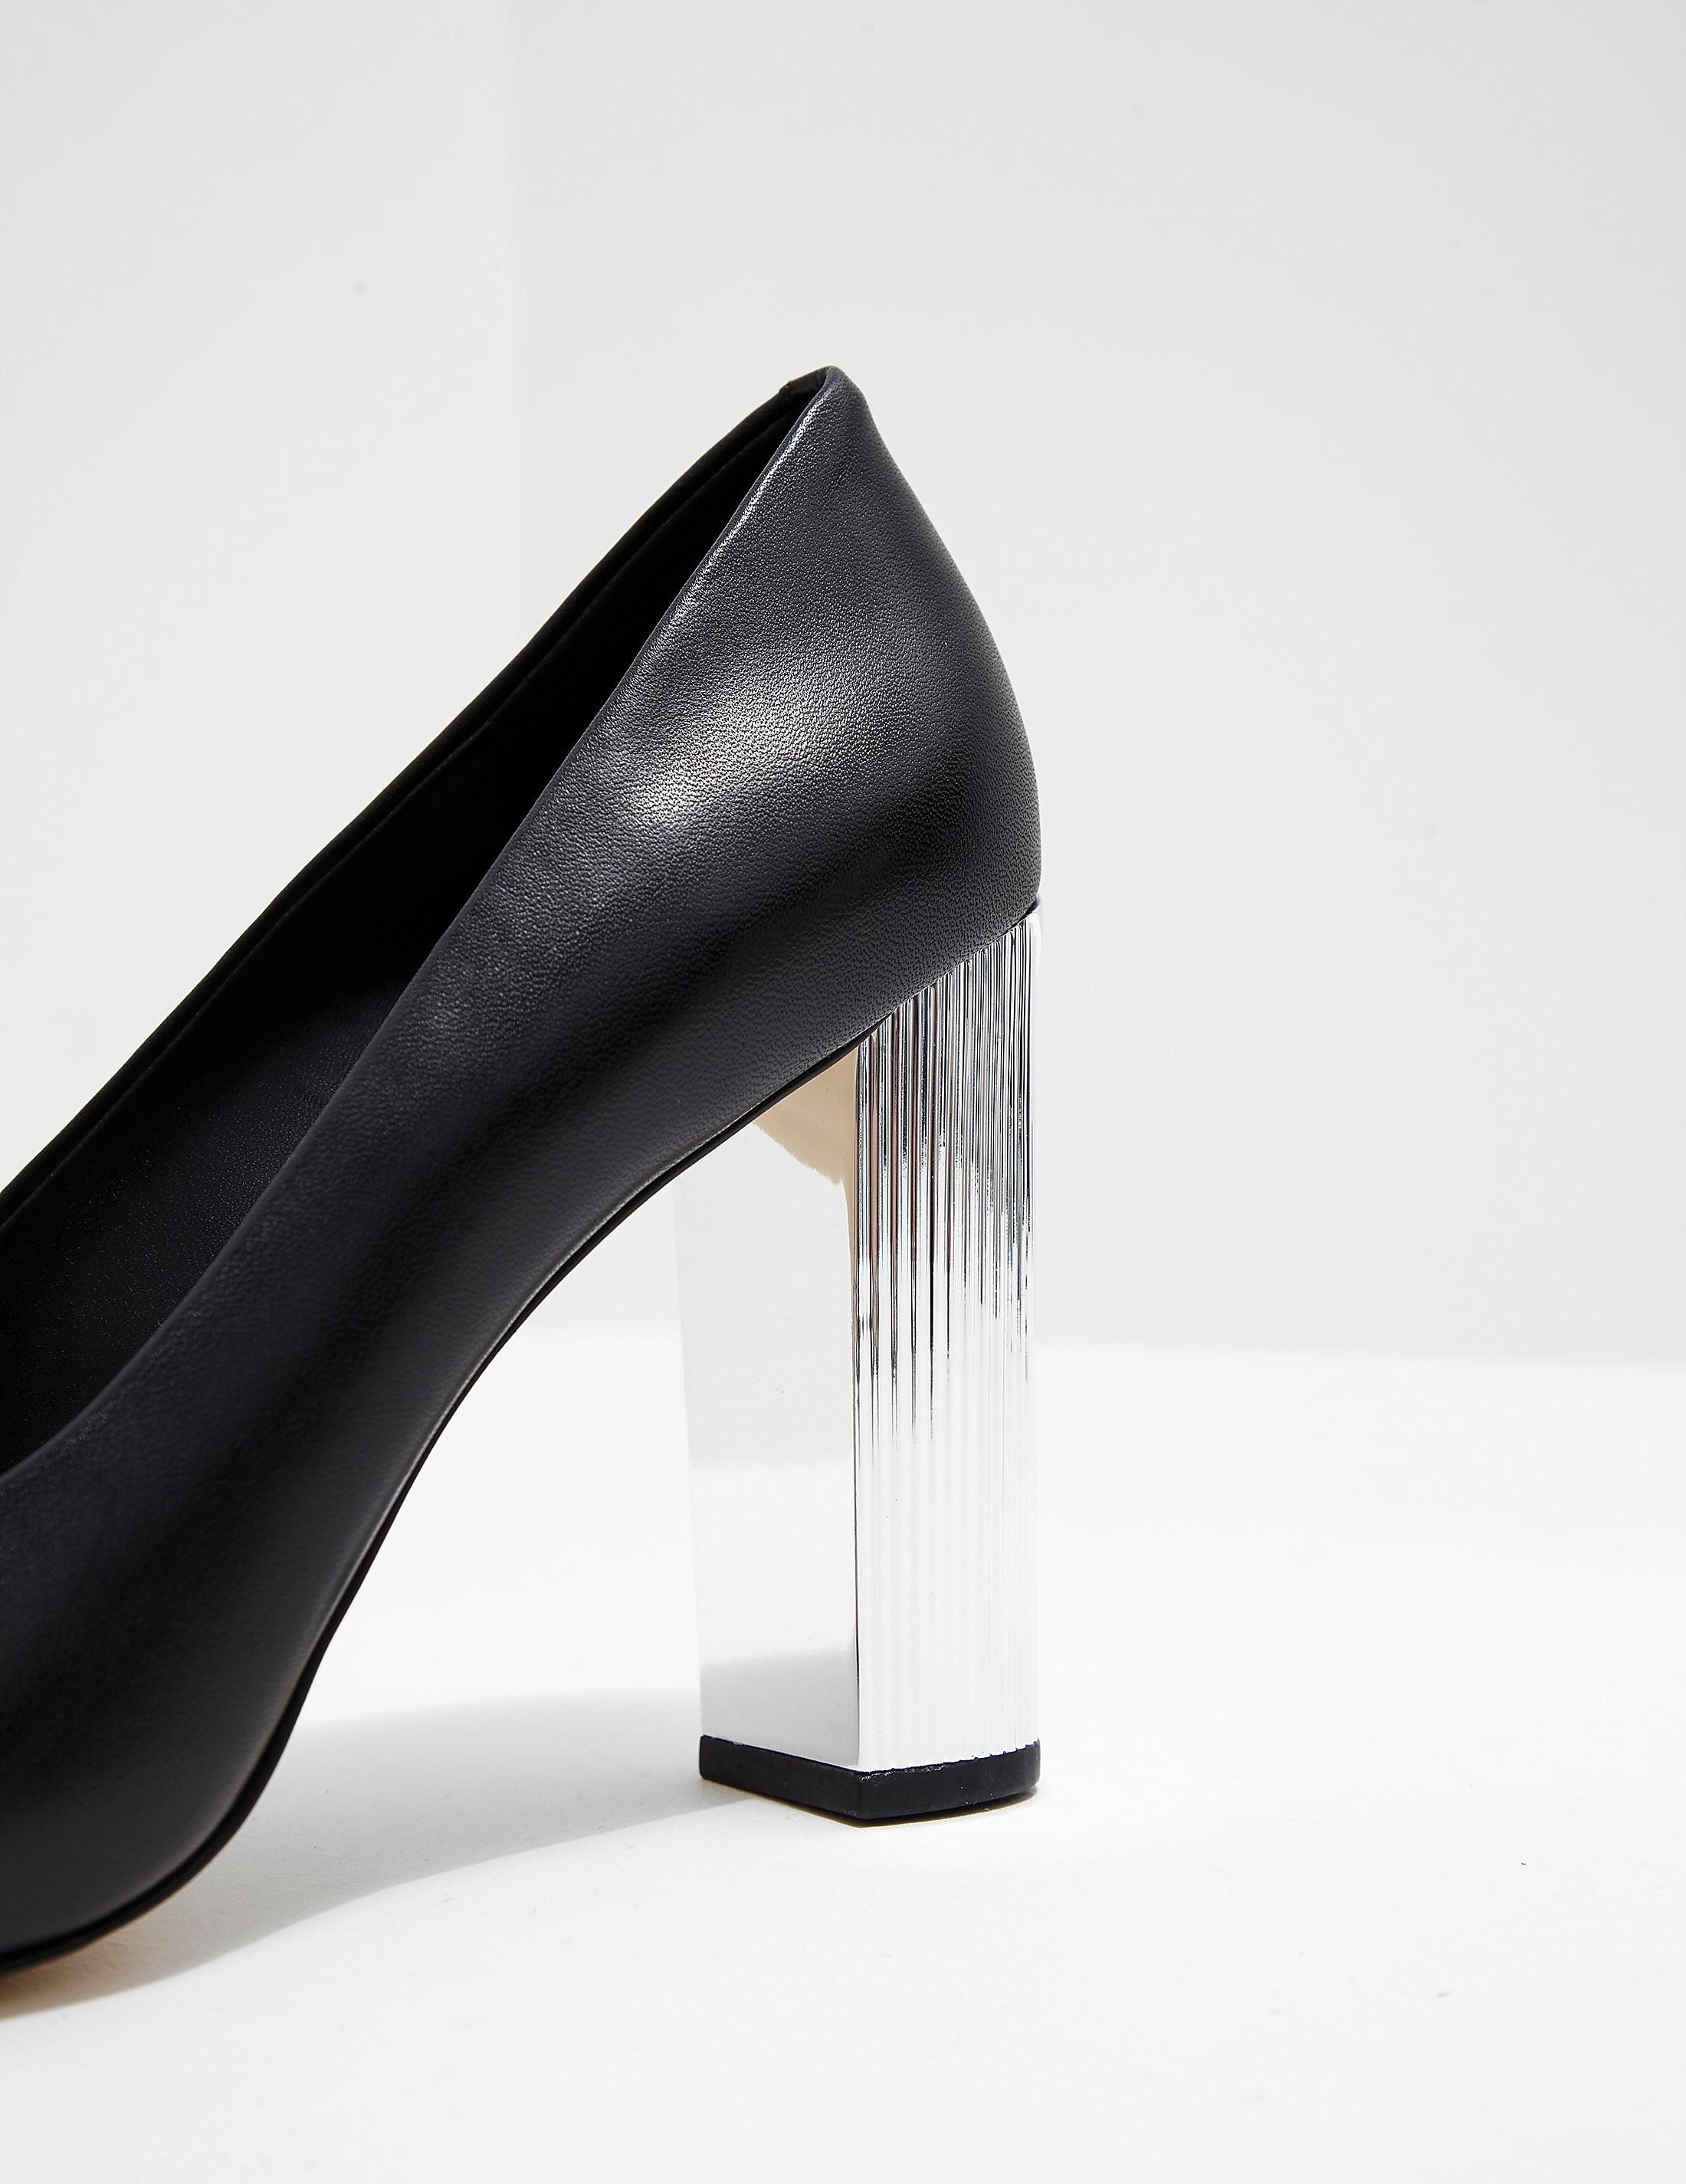 Michael Kors Paloma Heels